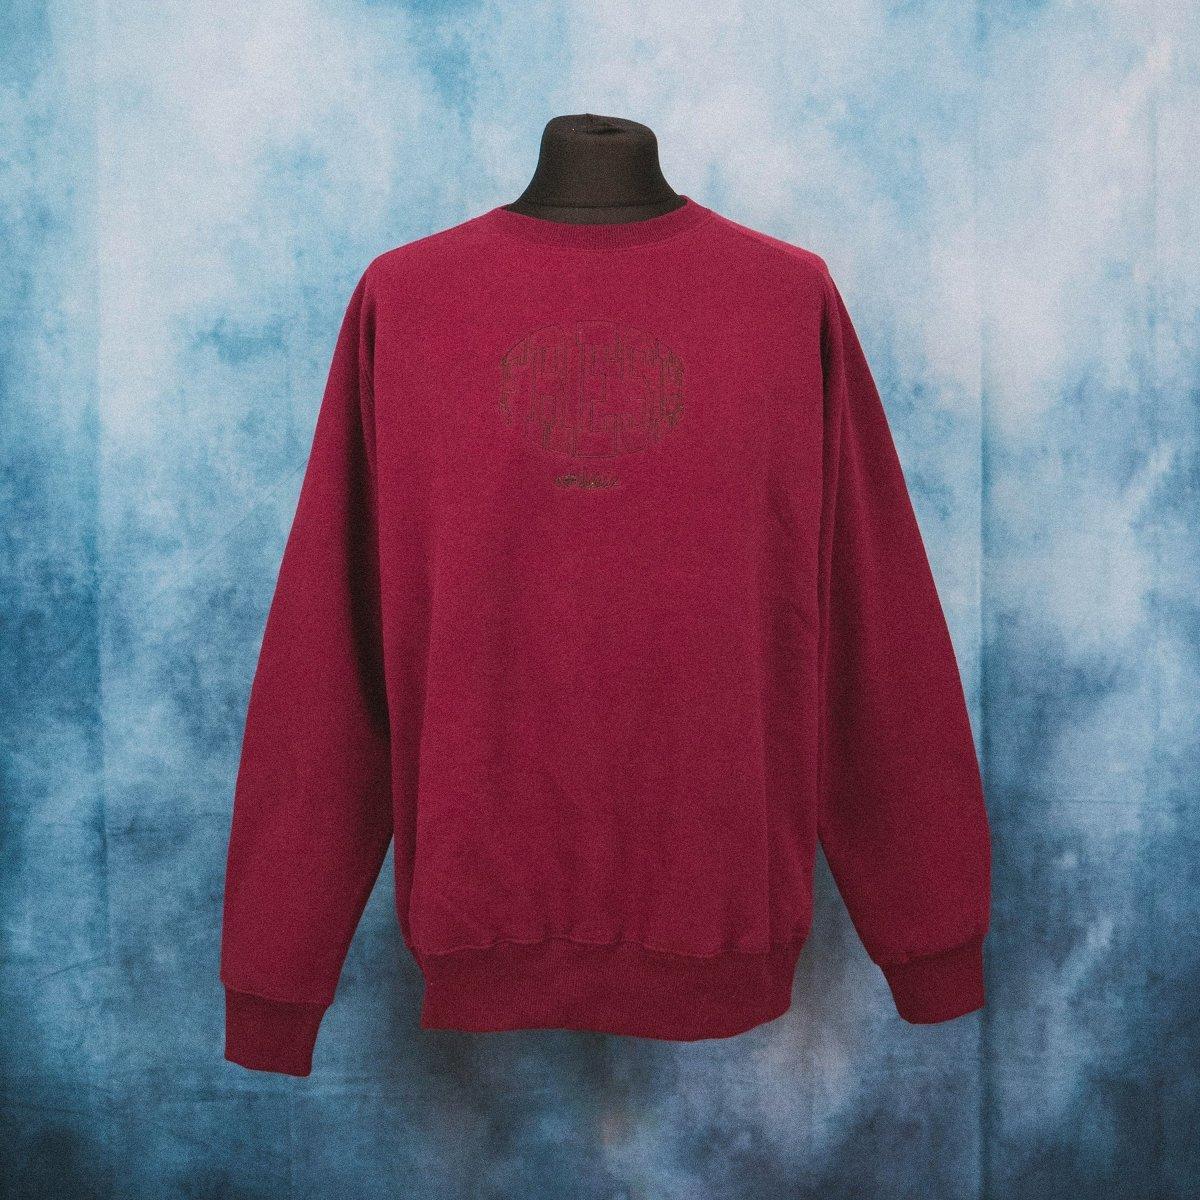 Fresh Athletic Burgundy Unisex Embroidered Heavy Sweater